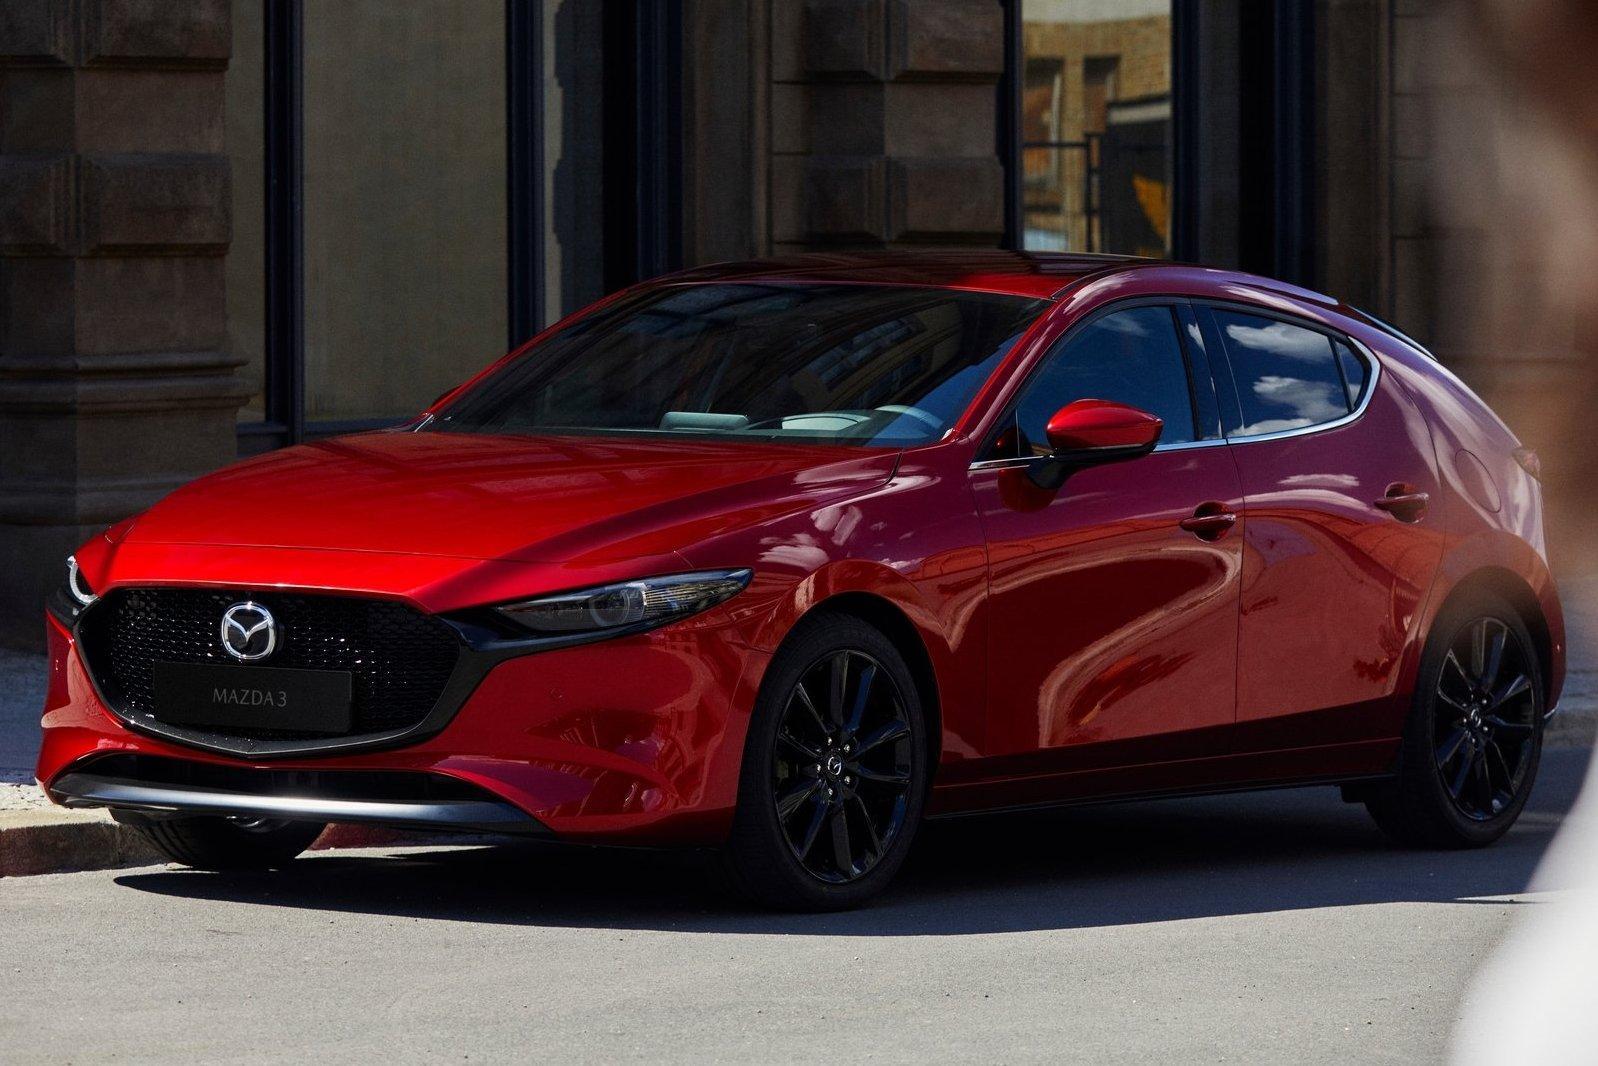 Автосалон в Лос-Анджелесе 2018: Mazda3